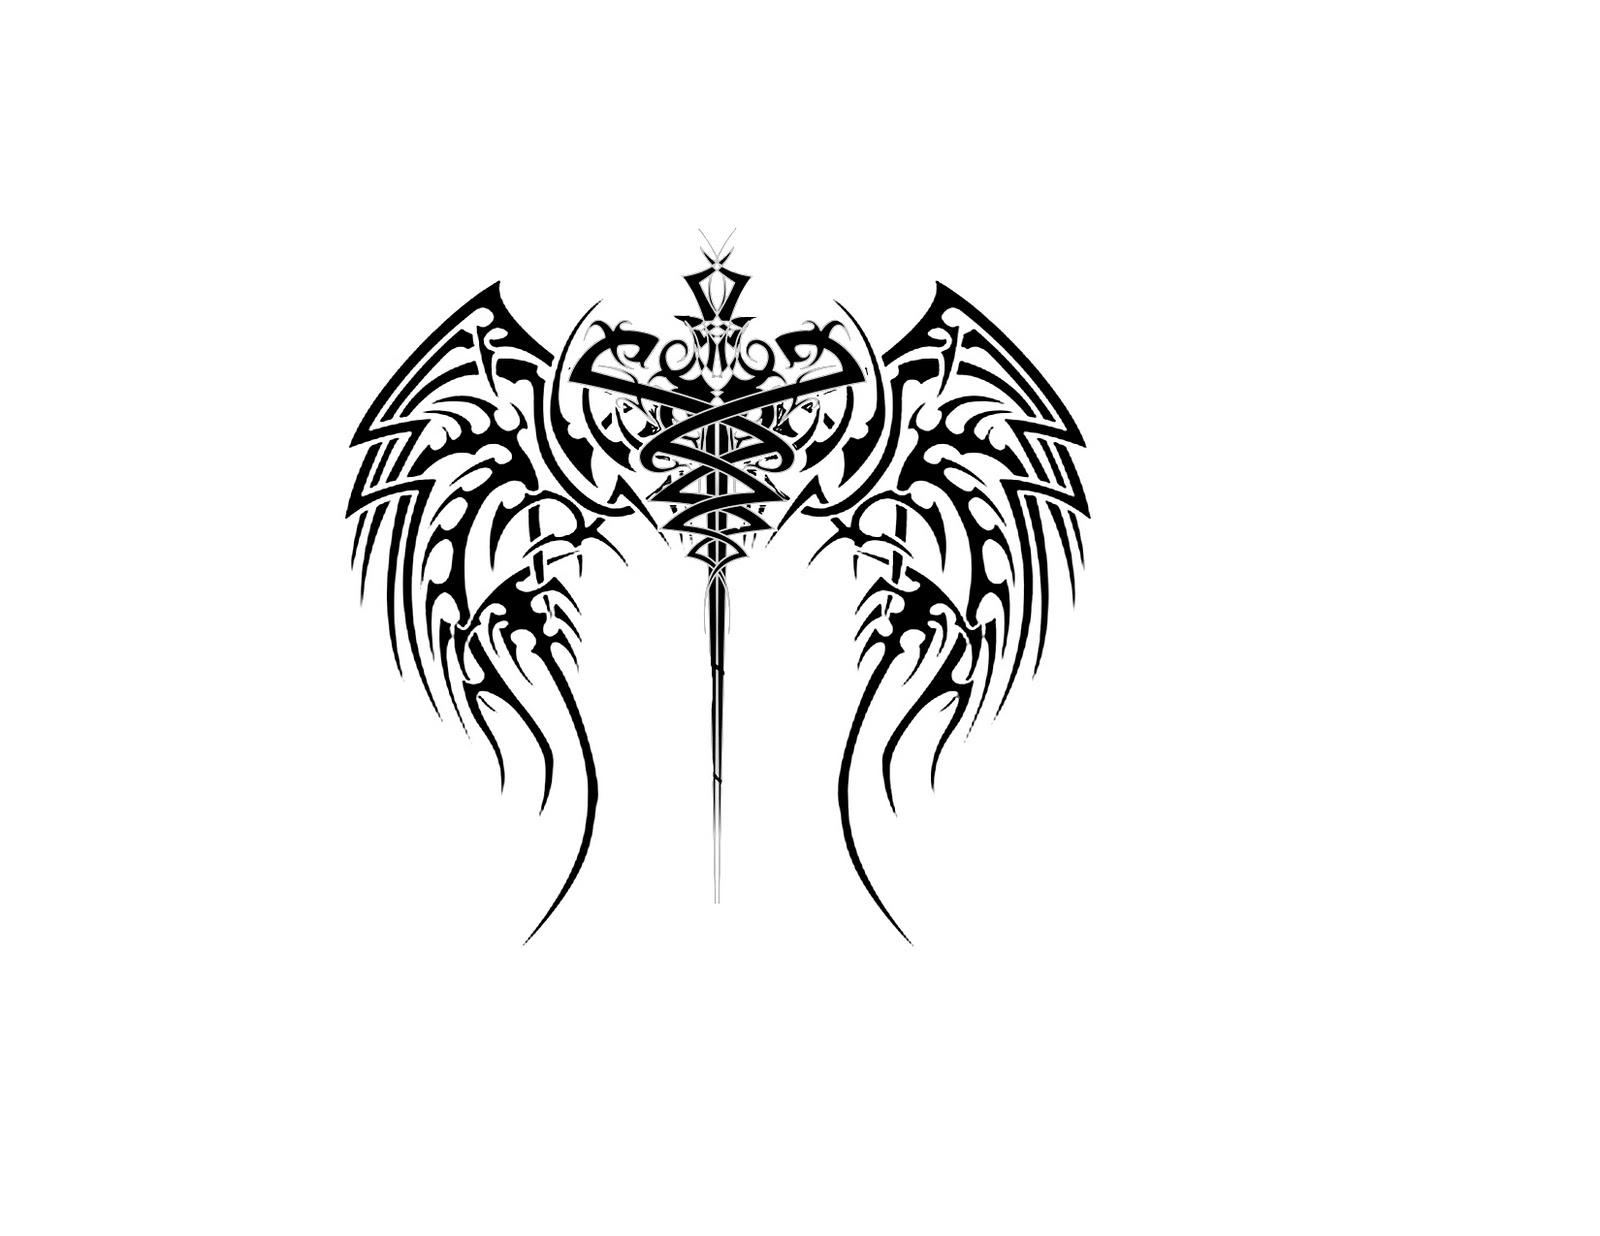 how to draw skyrim logo